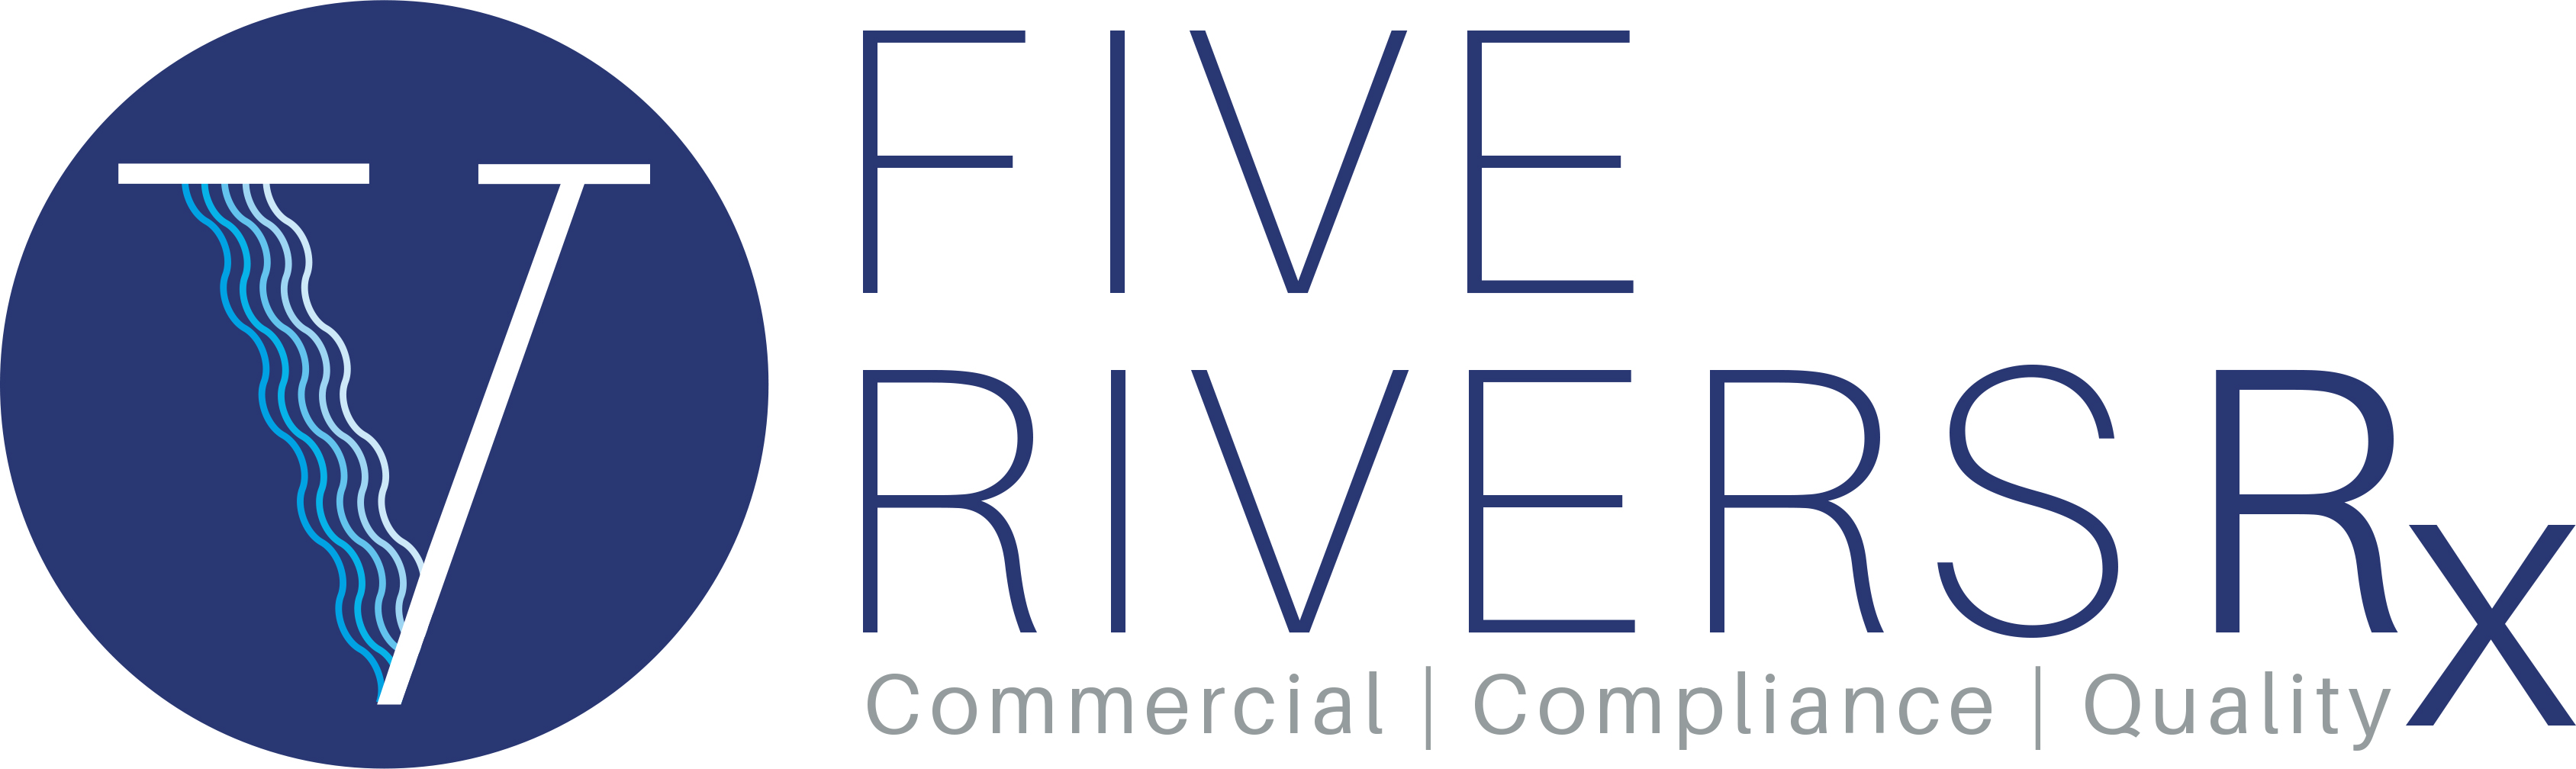 Five Rivers RX